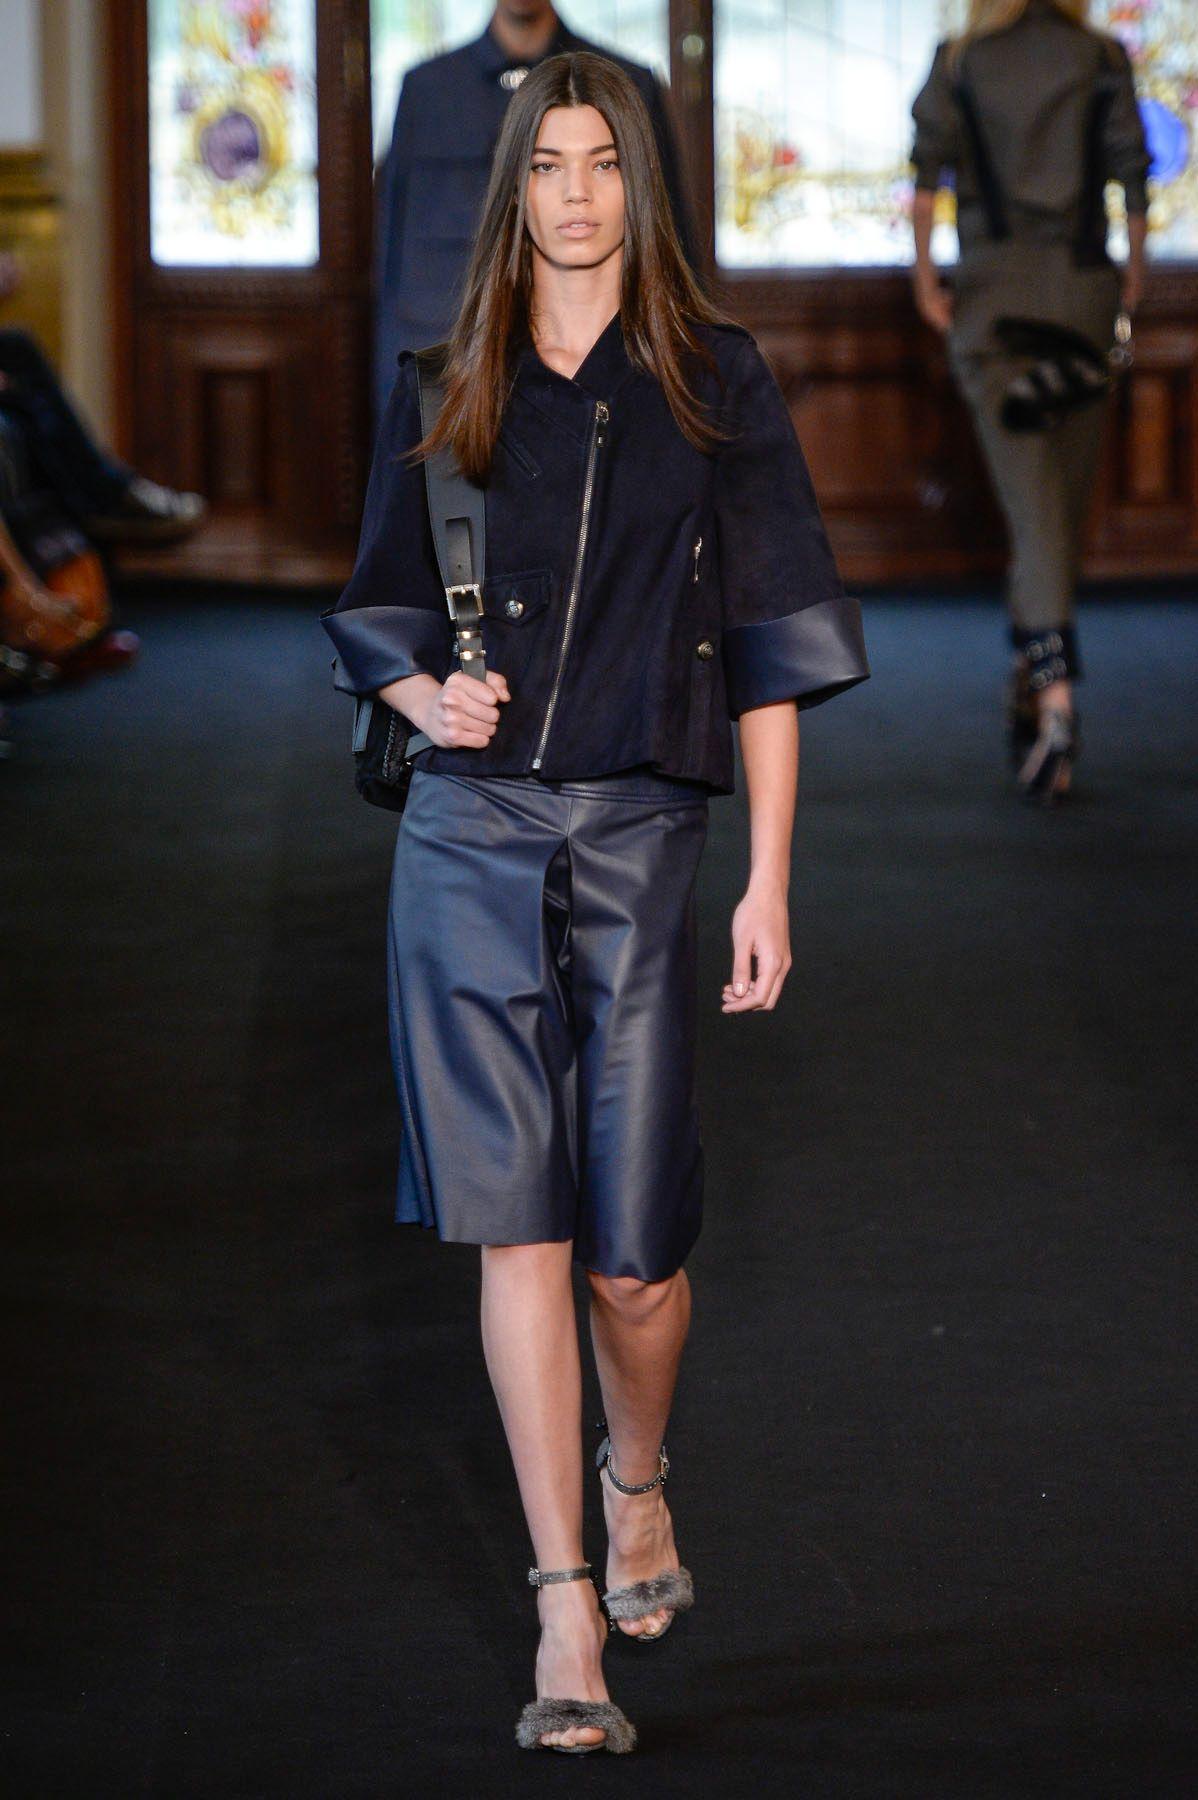 +++ Ellus + Fall / Winter 2014 2015 + SPFW + RTW +++  #utilitarian #MountainSports #jacquard #sequins #japan #samurai #denim #leather #wool #RawDenim #SaoPaulo #urban #Invierno2014 #winter2014 #Jeanswear #fashion #moda #fashionweek @EllusJeansDeluxe #EllusJeans #Ellus #spfw @SPFWoficial @ISAZAalejandro